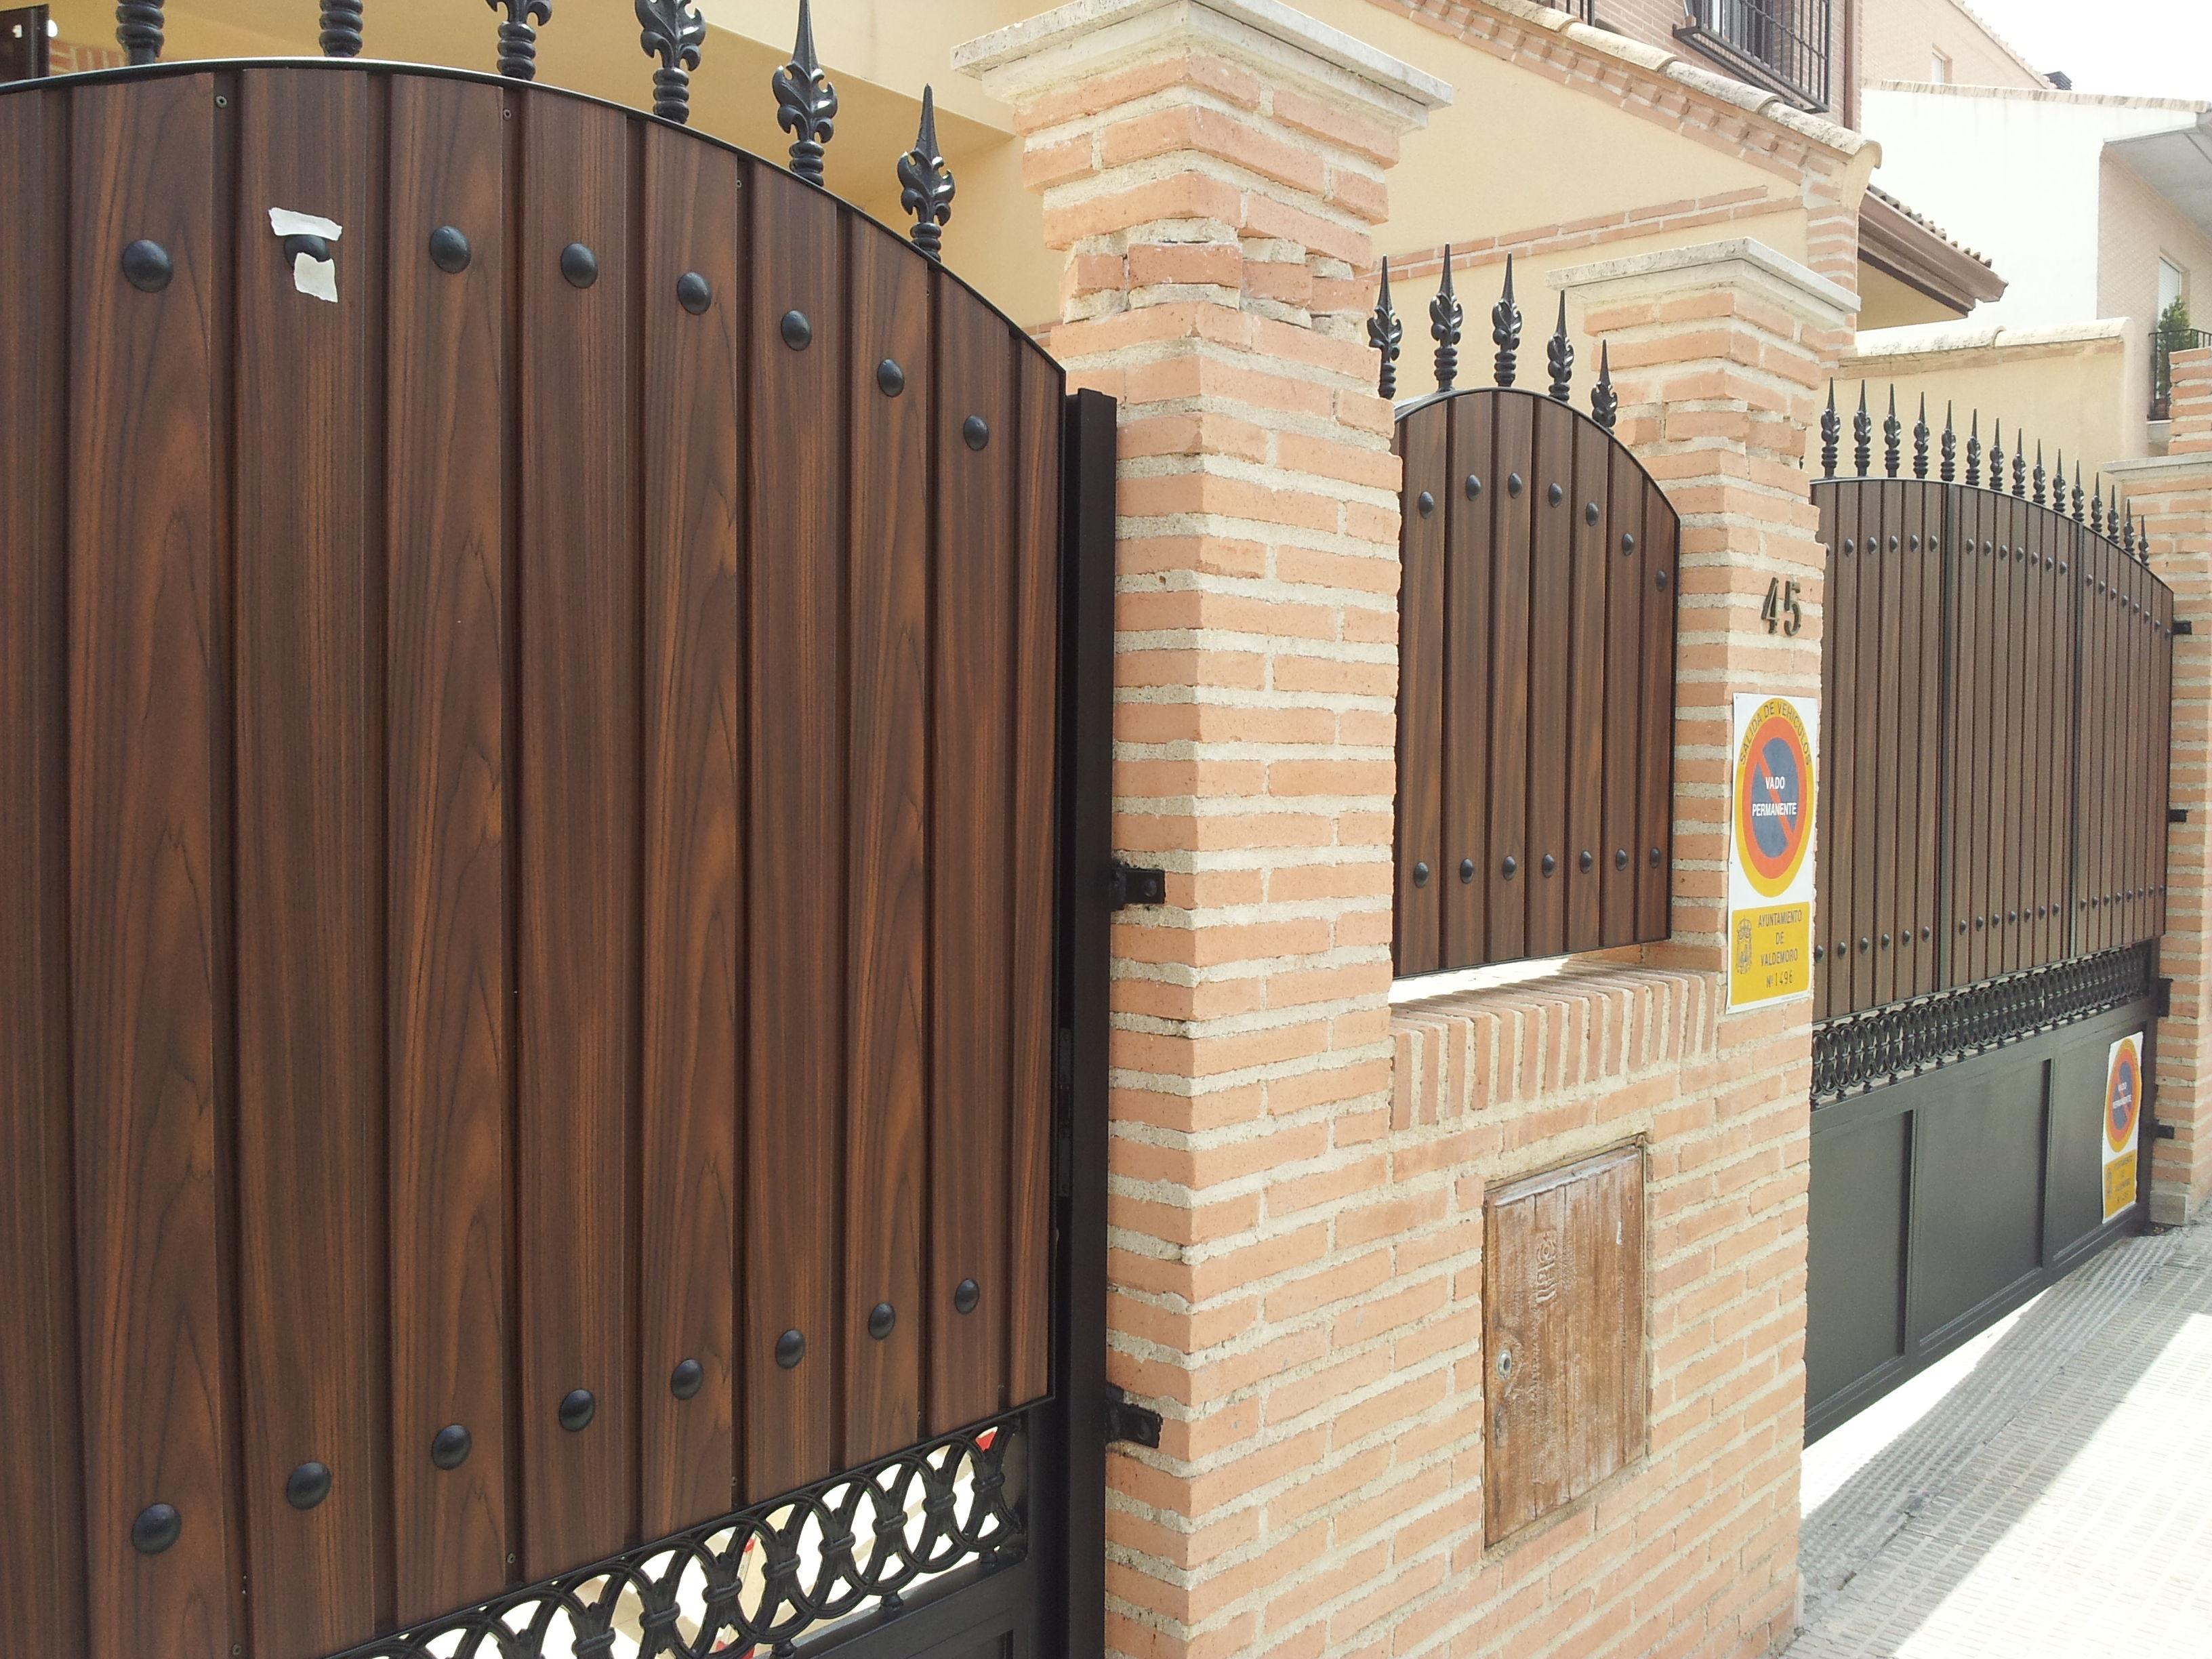 Cancelas de madera castellana medio punto ventanas de for Puertas imitacion madera exterior